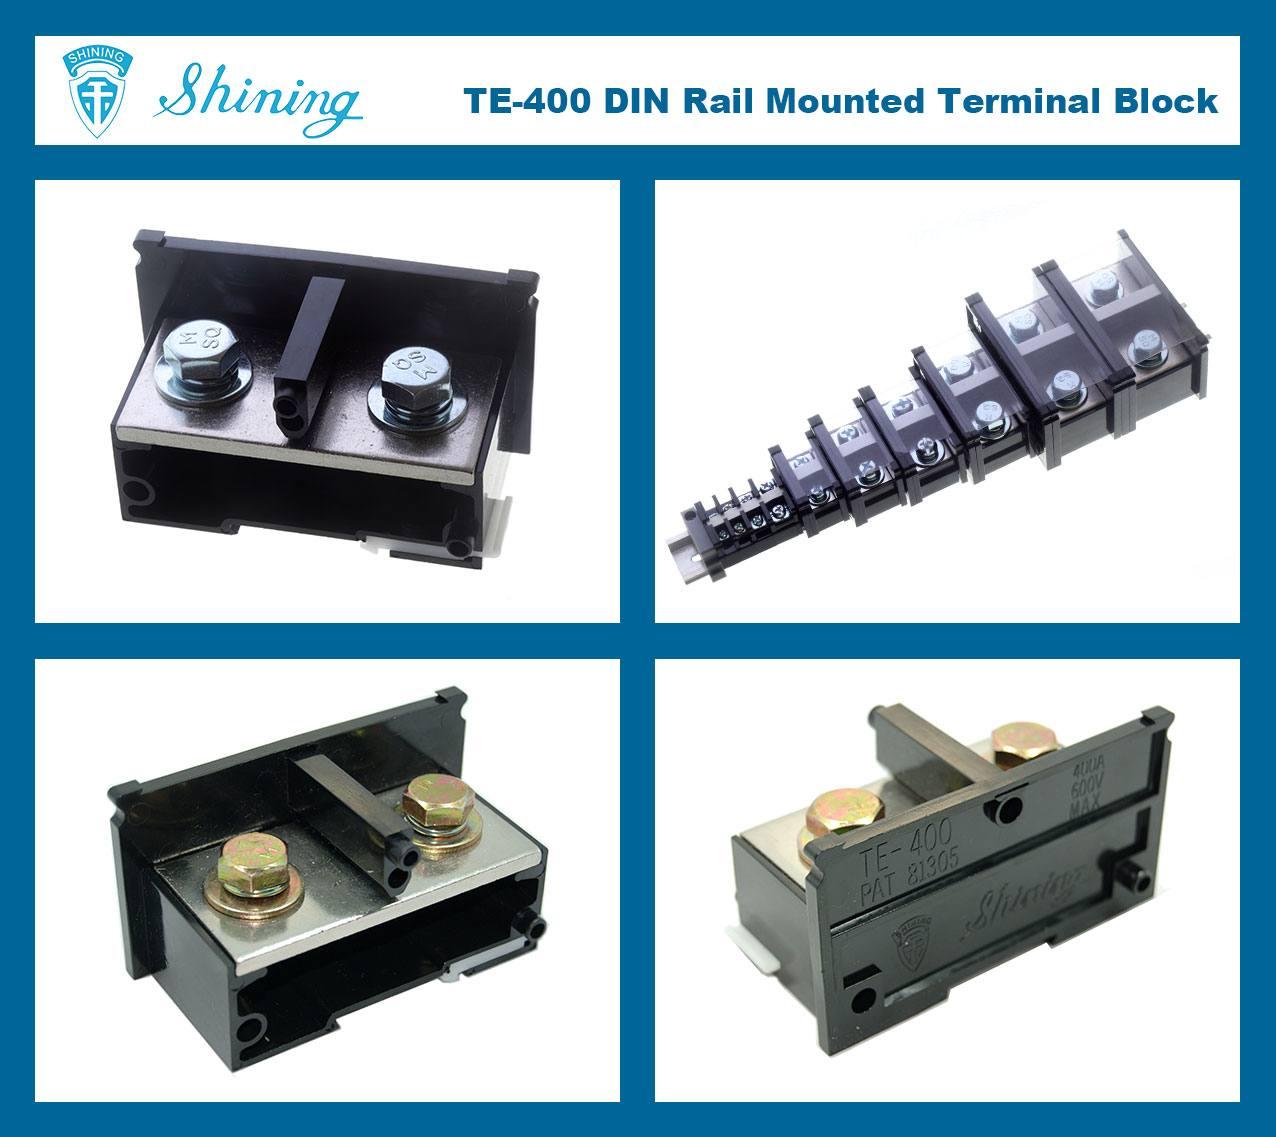 SHINING-TE-400 35mm Din Rail Mounted Assembly Type 600V 400A Terminal Strip